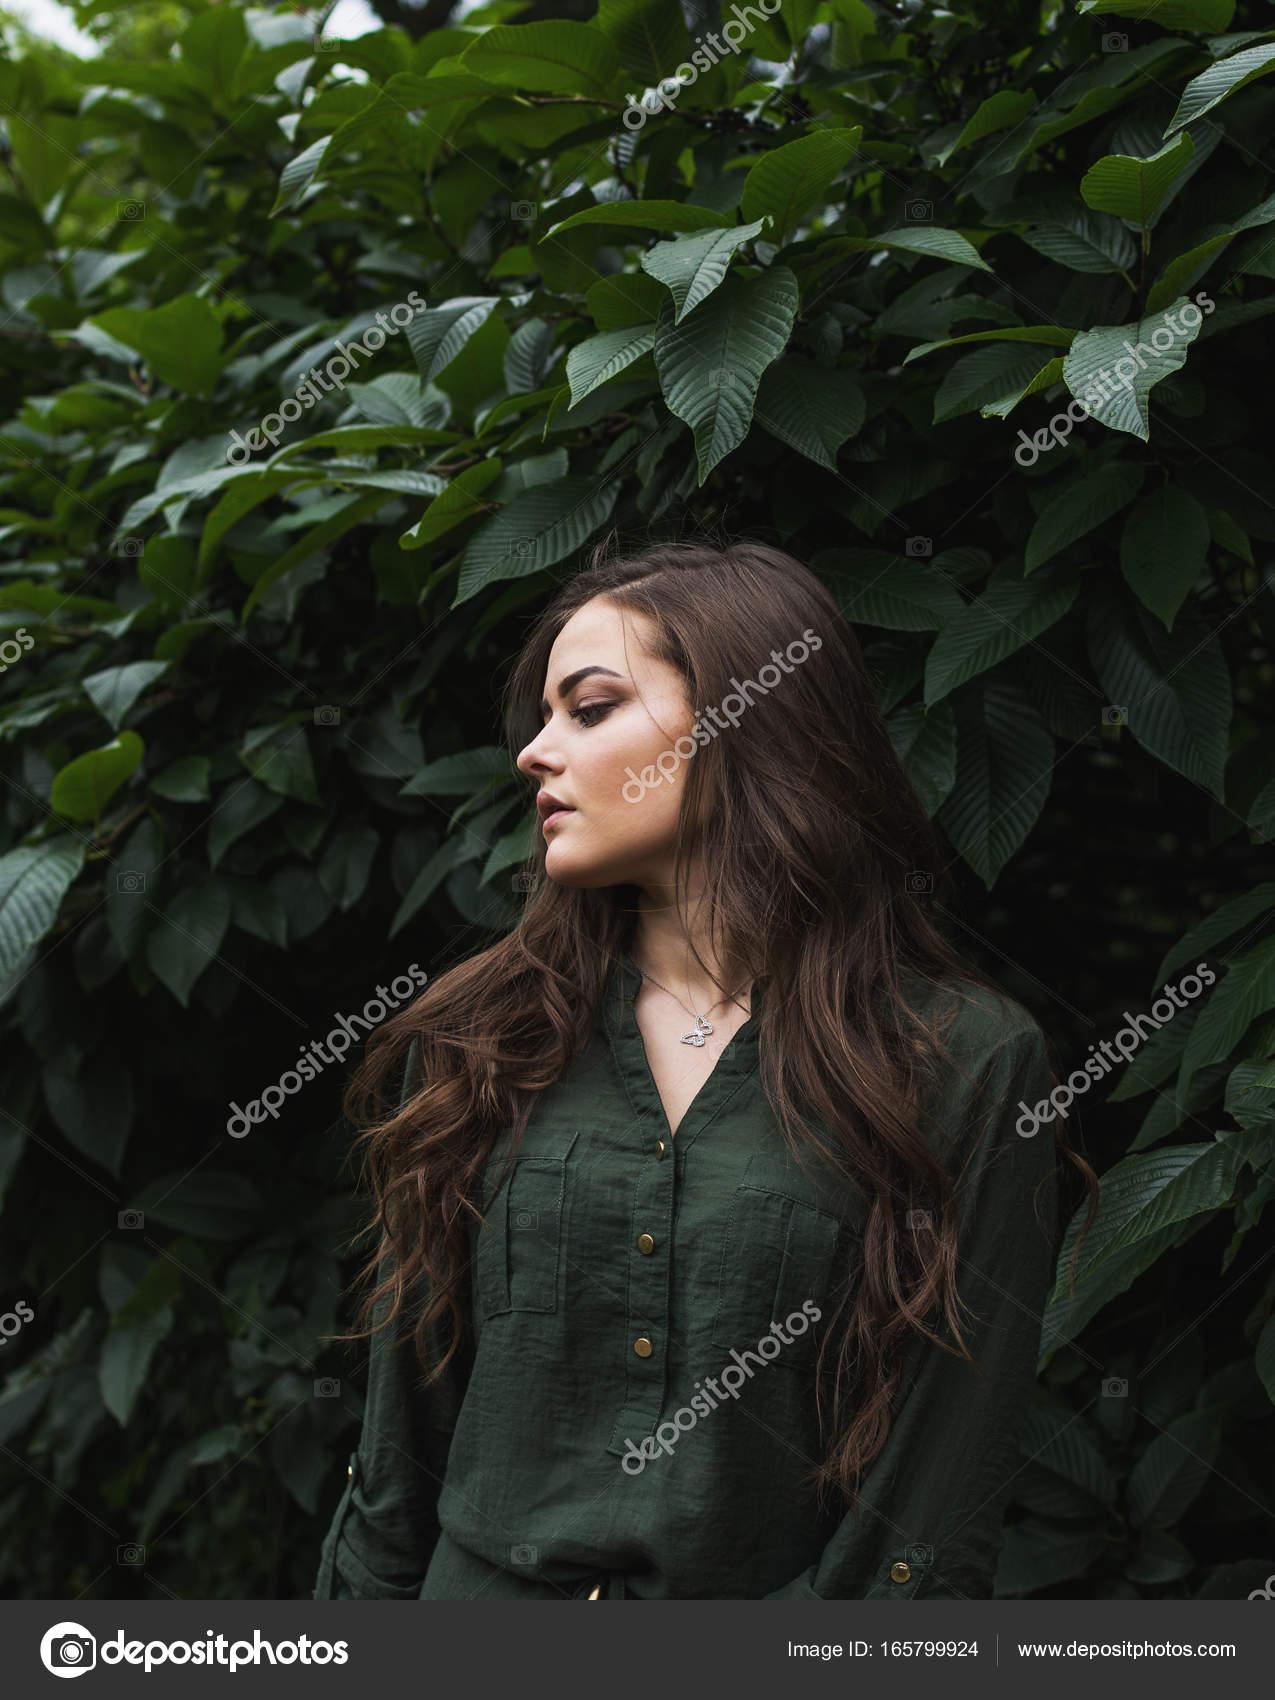 2a29eed54588 Όμορφη εφηβική μοντέλο ντυμένος με μόδας πράσινο φόρεμα θέτοντας σε εξωτερικούς  χώρους σε πάρκο. Τονισμένα με ζεστά χρώματα — Εικόνα από ...